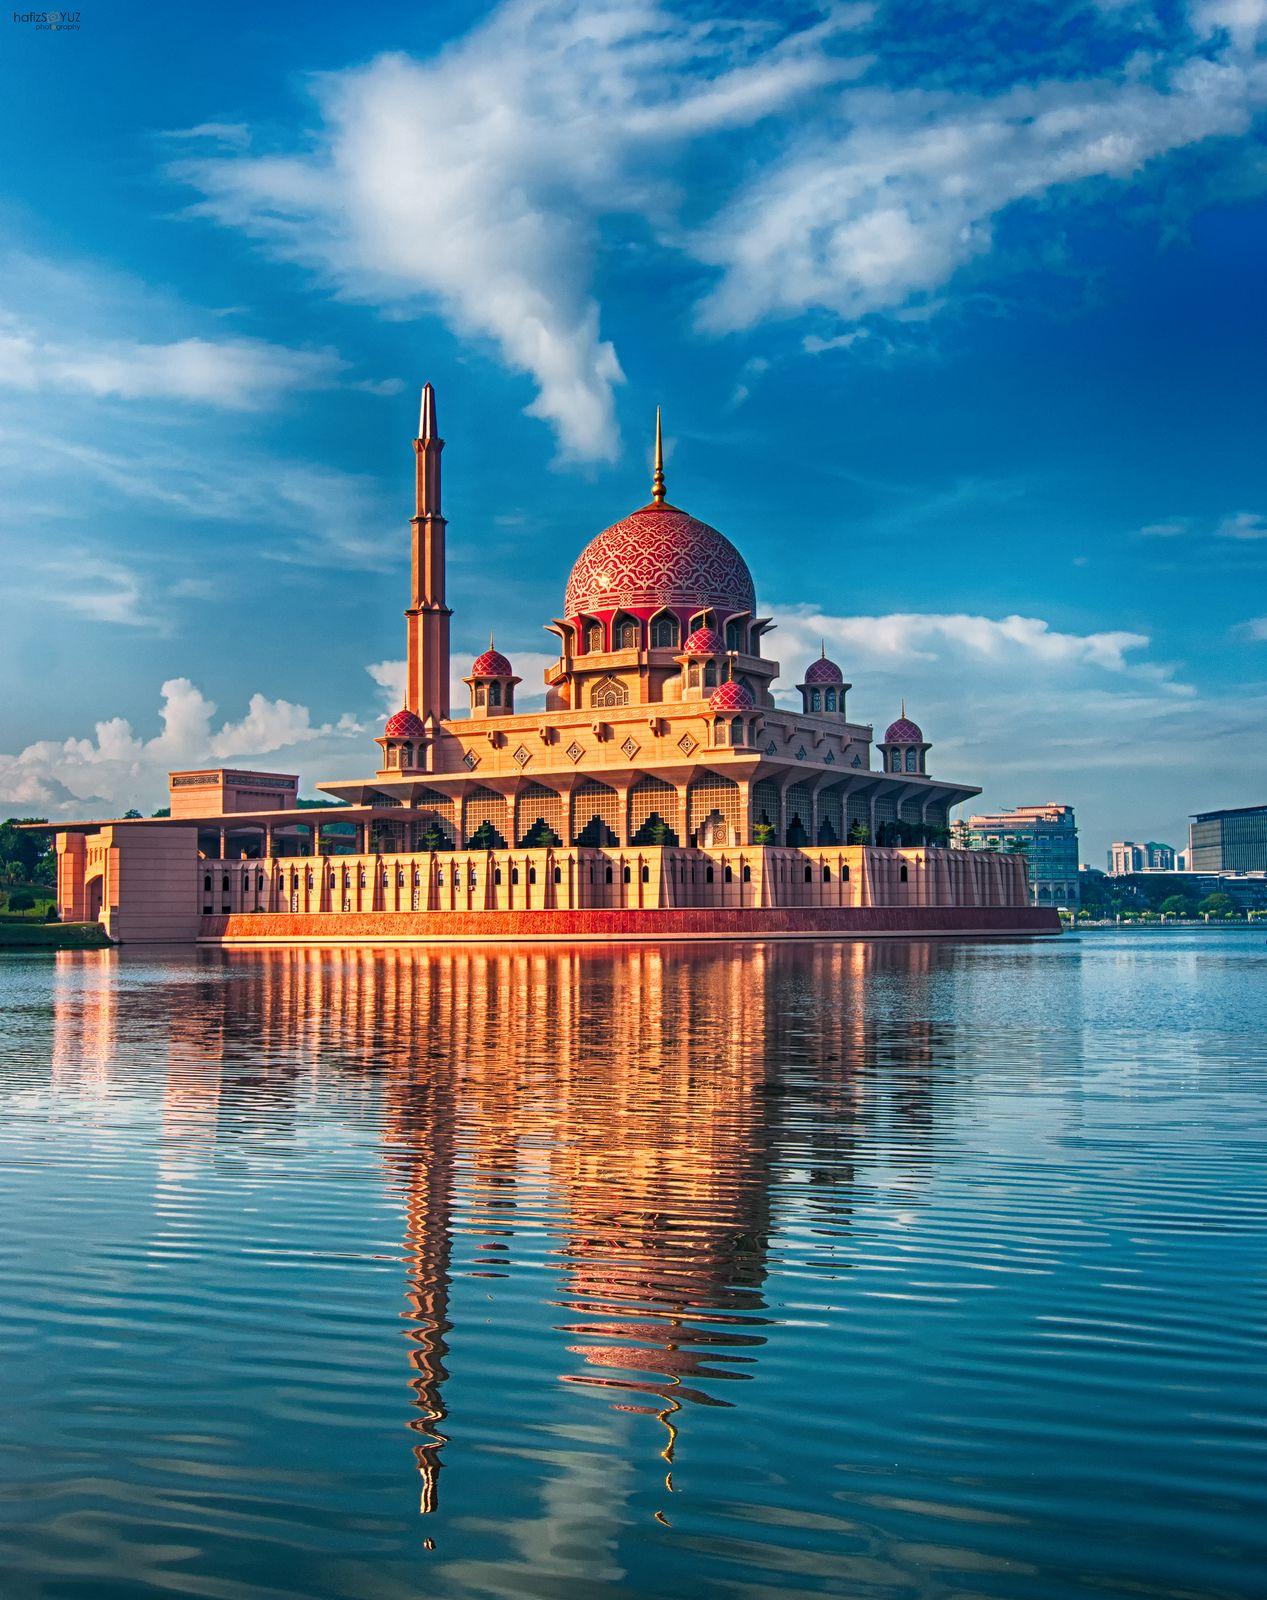 Putrajaya Mosque - Best Day Trips from Kuala Lumpur - Ummi Goes Where